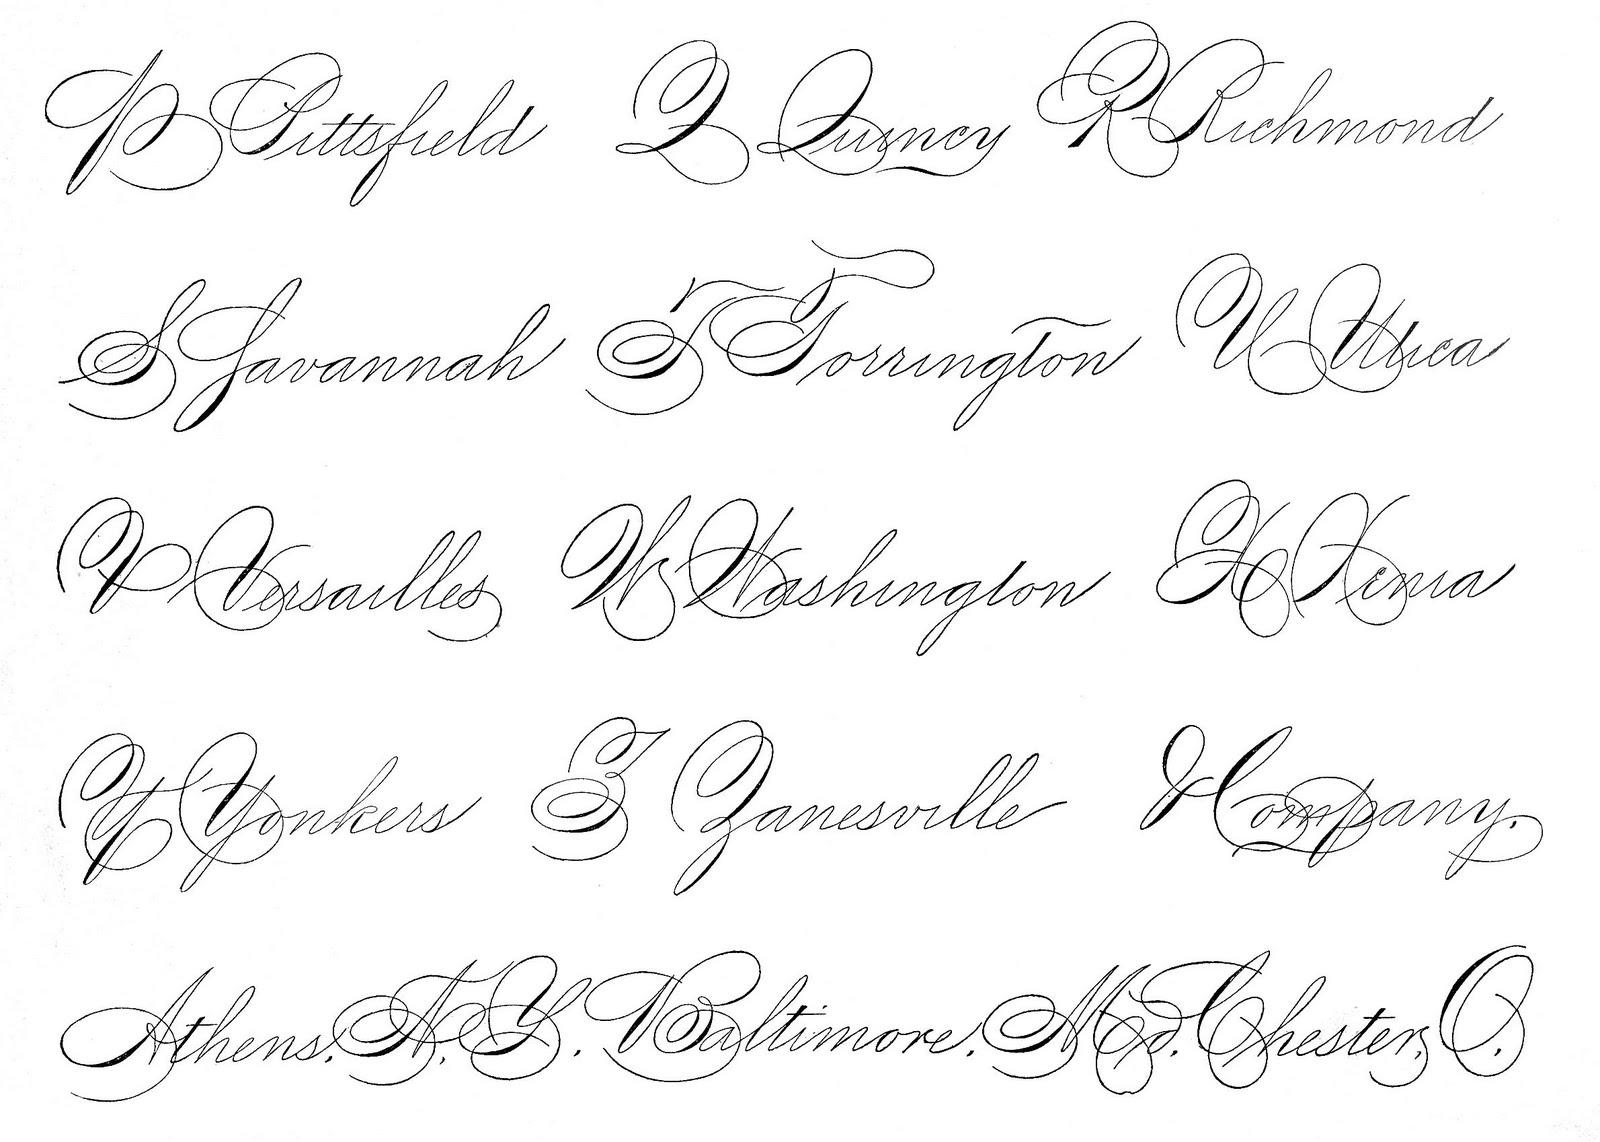 Book Quotes Wallpaper Cursive Spencerian Saturday Pen Flourished Words The Graphics